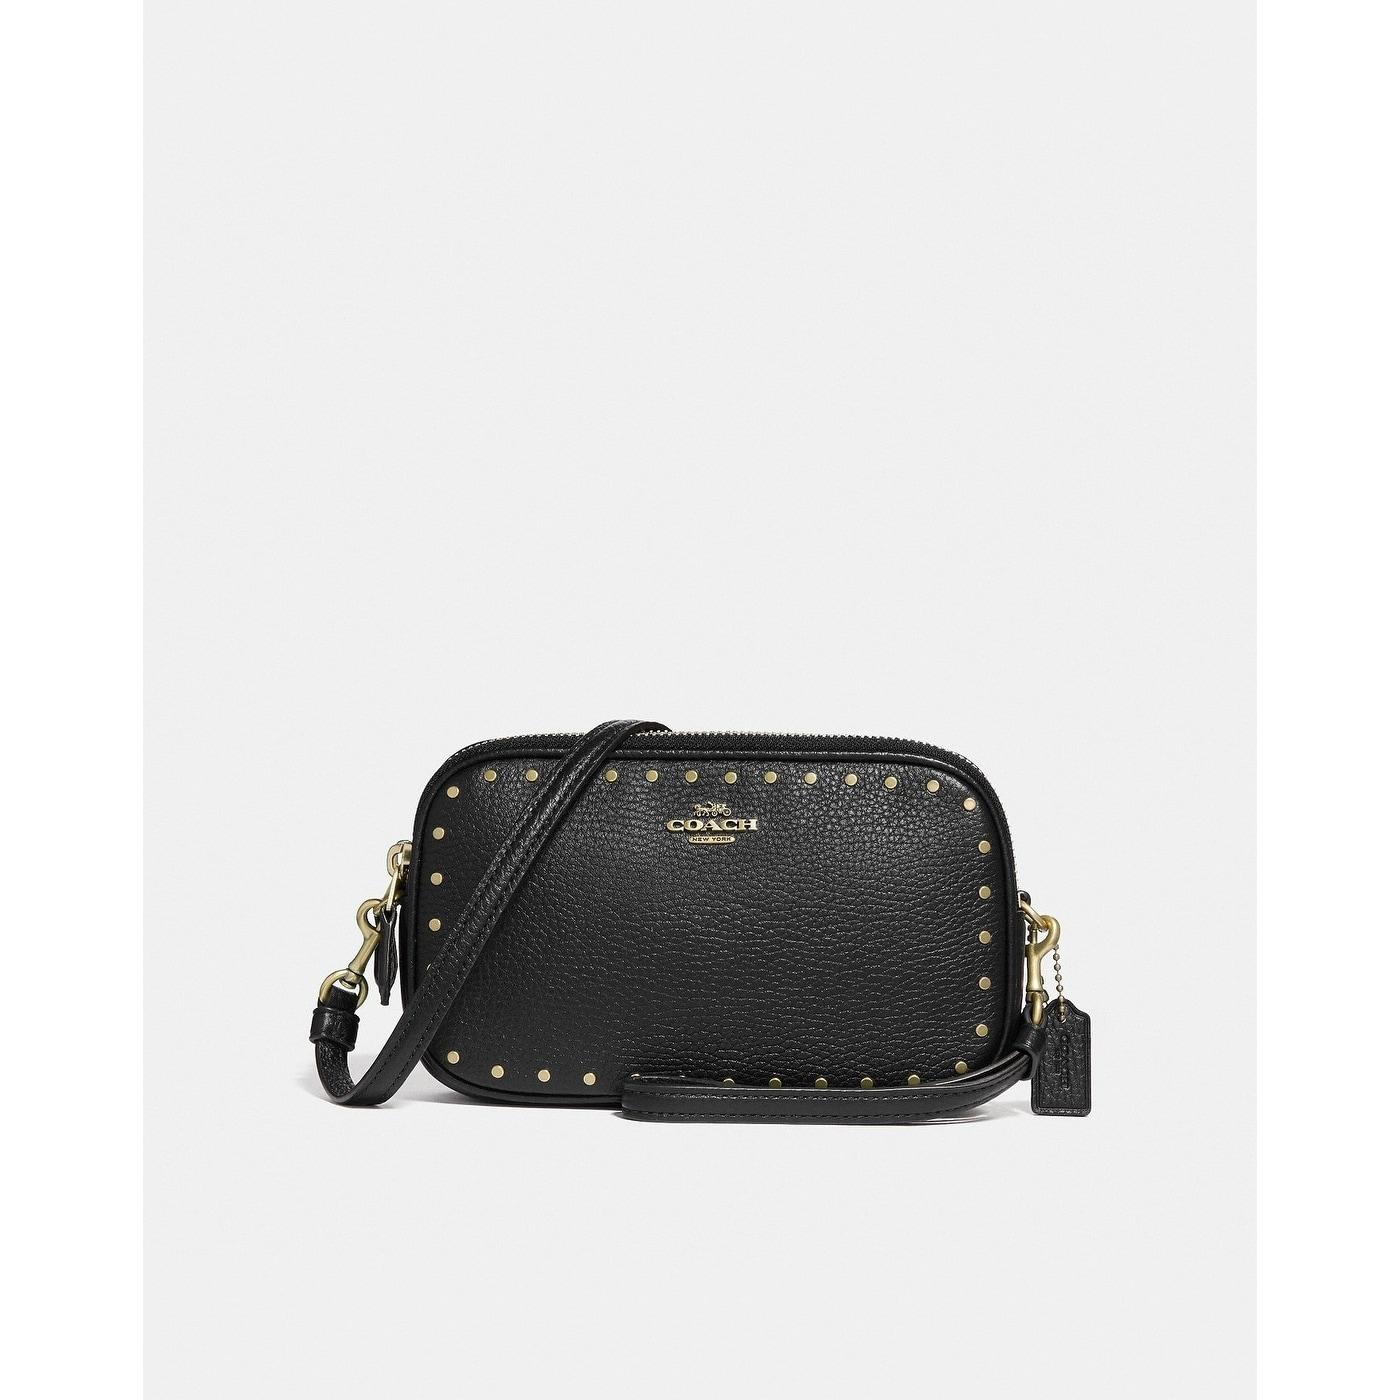 fb31b69518ef Coach Handbags